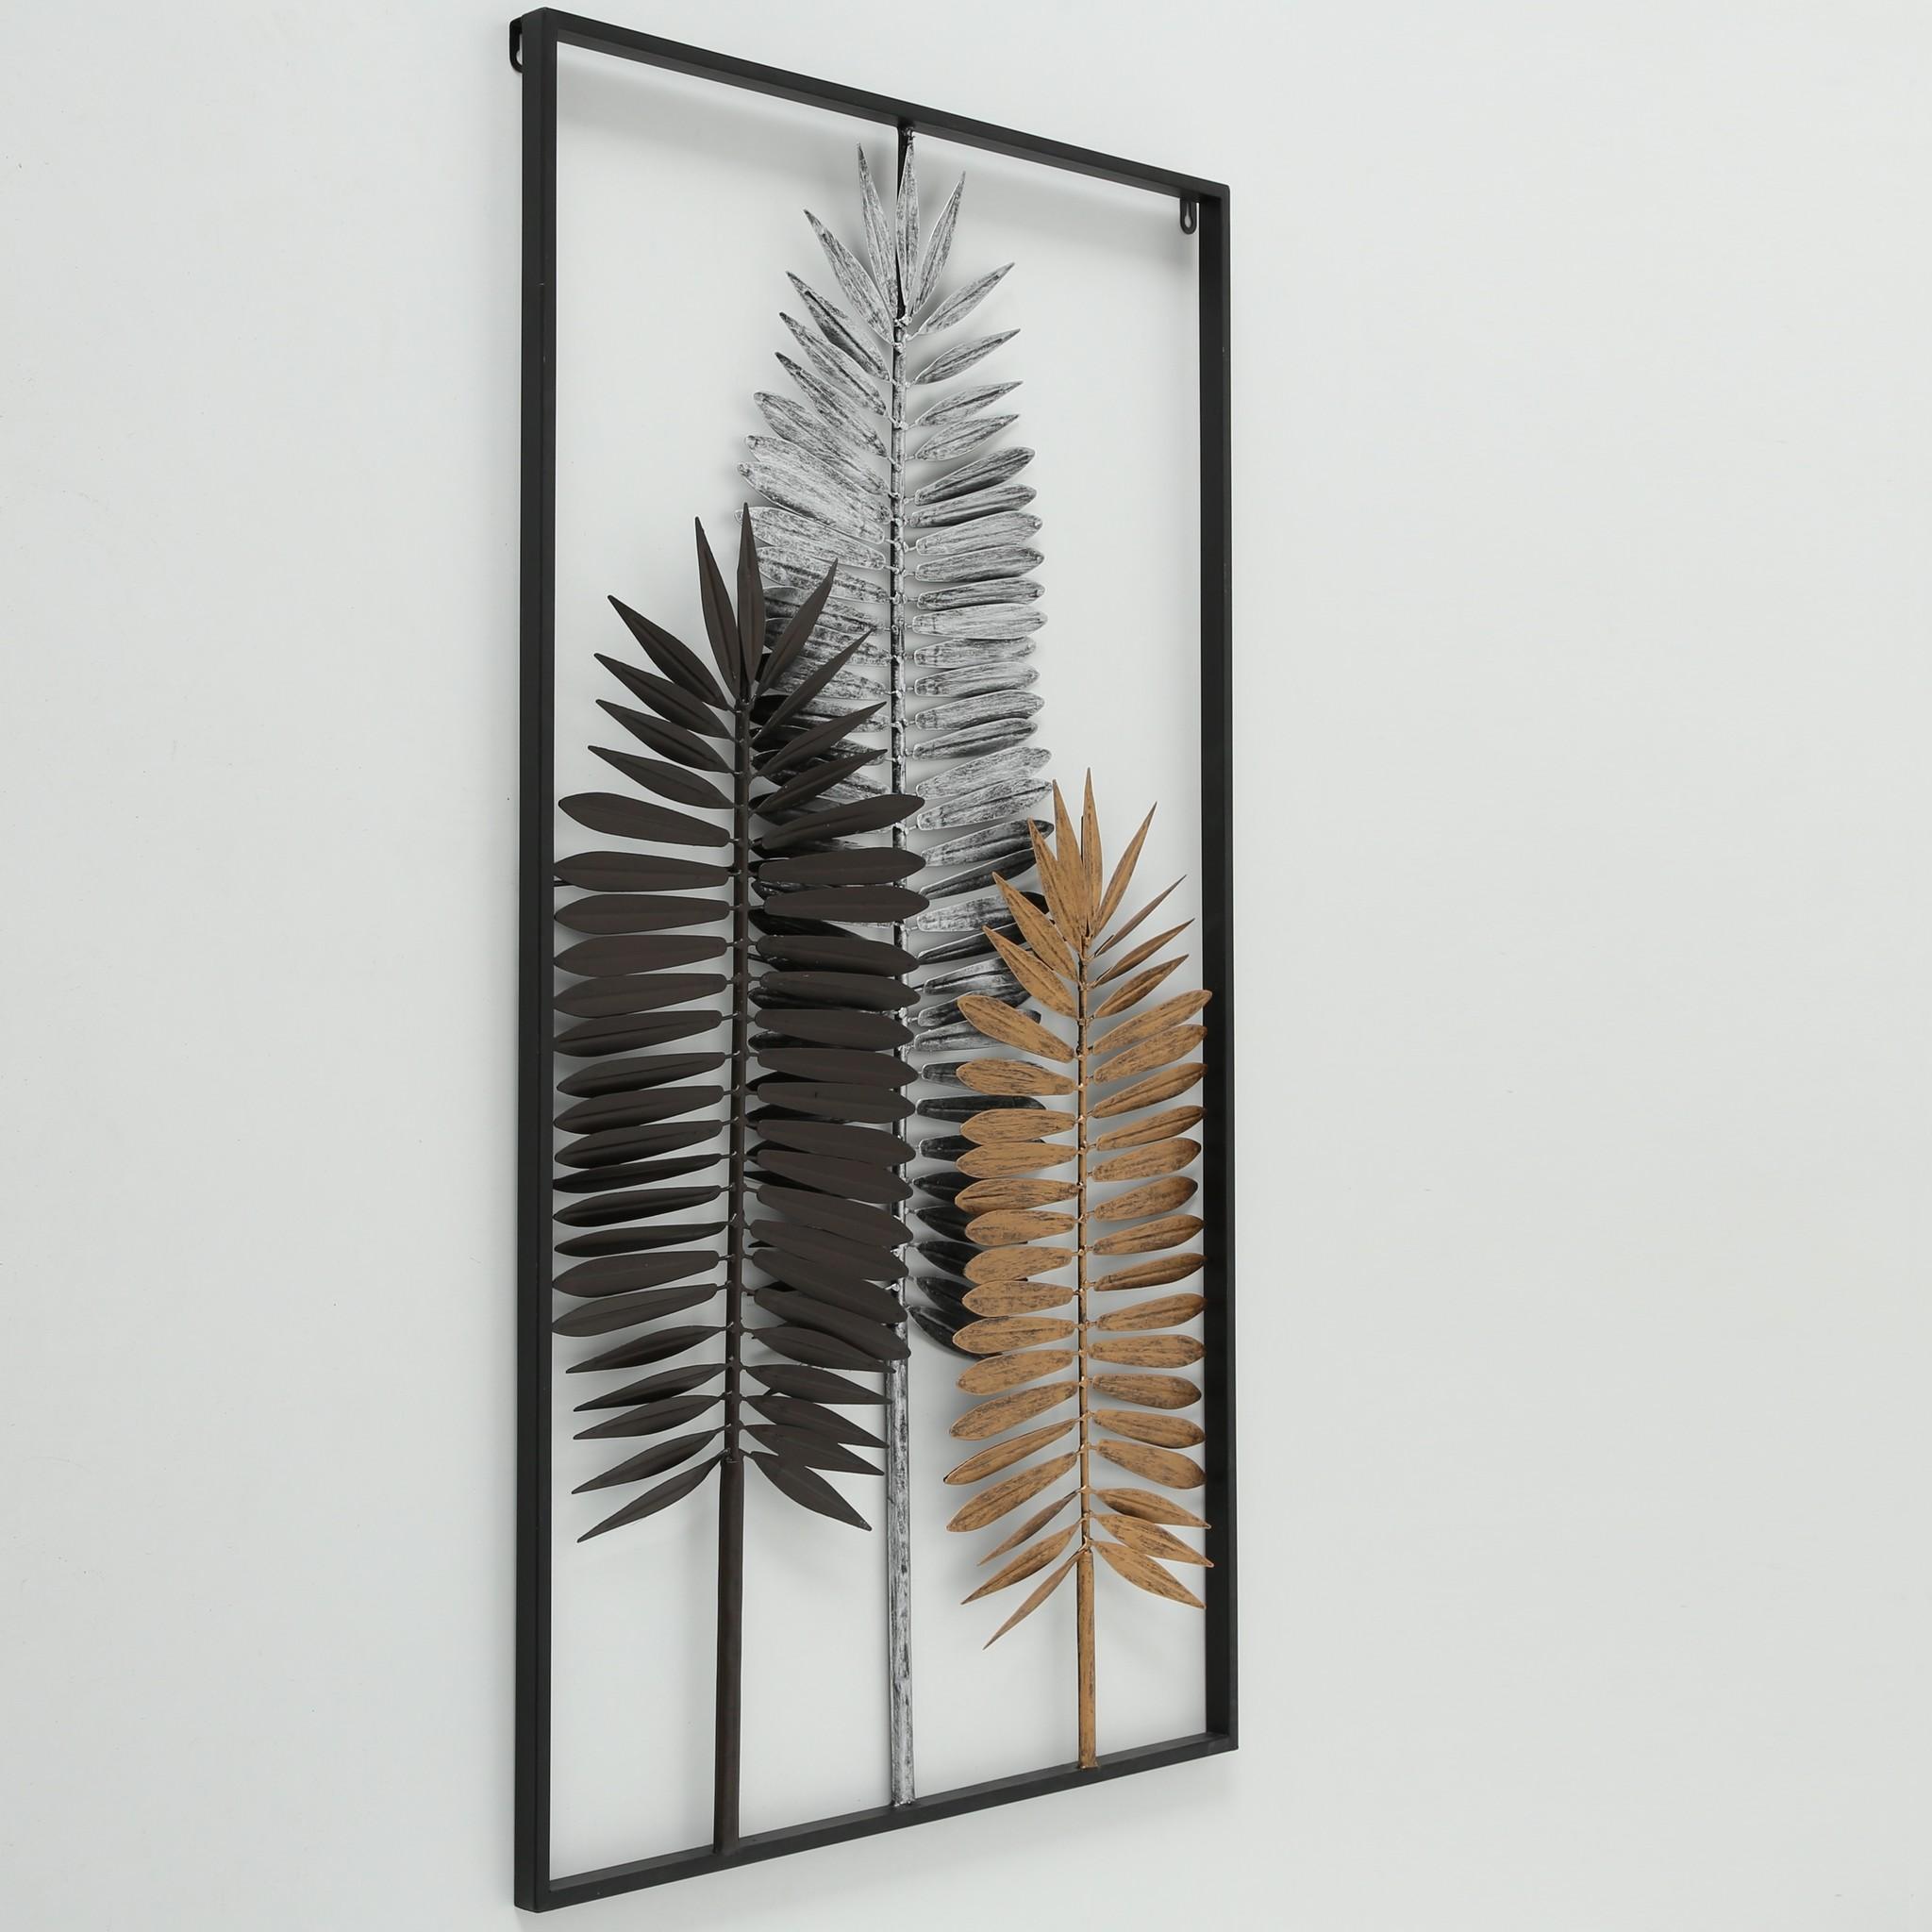 Wanddekoration 3d Yama 102 cm hoch